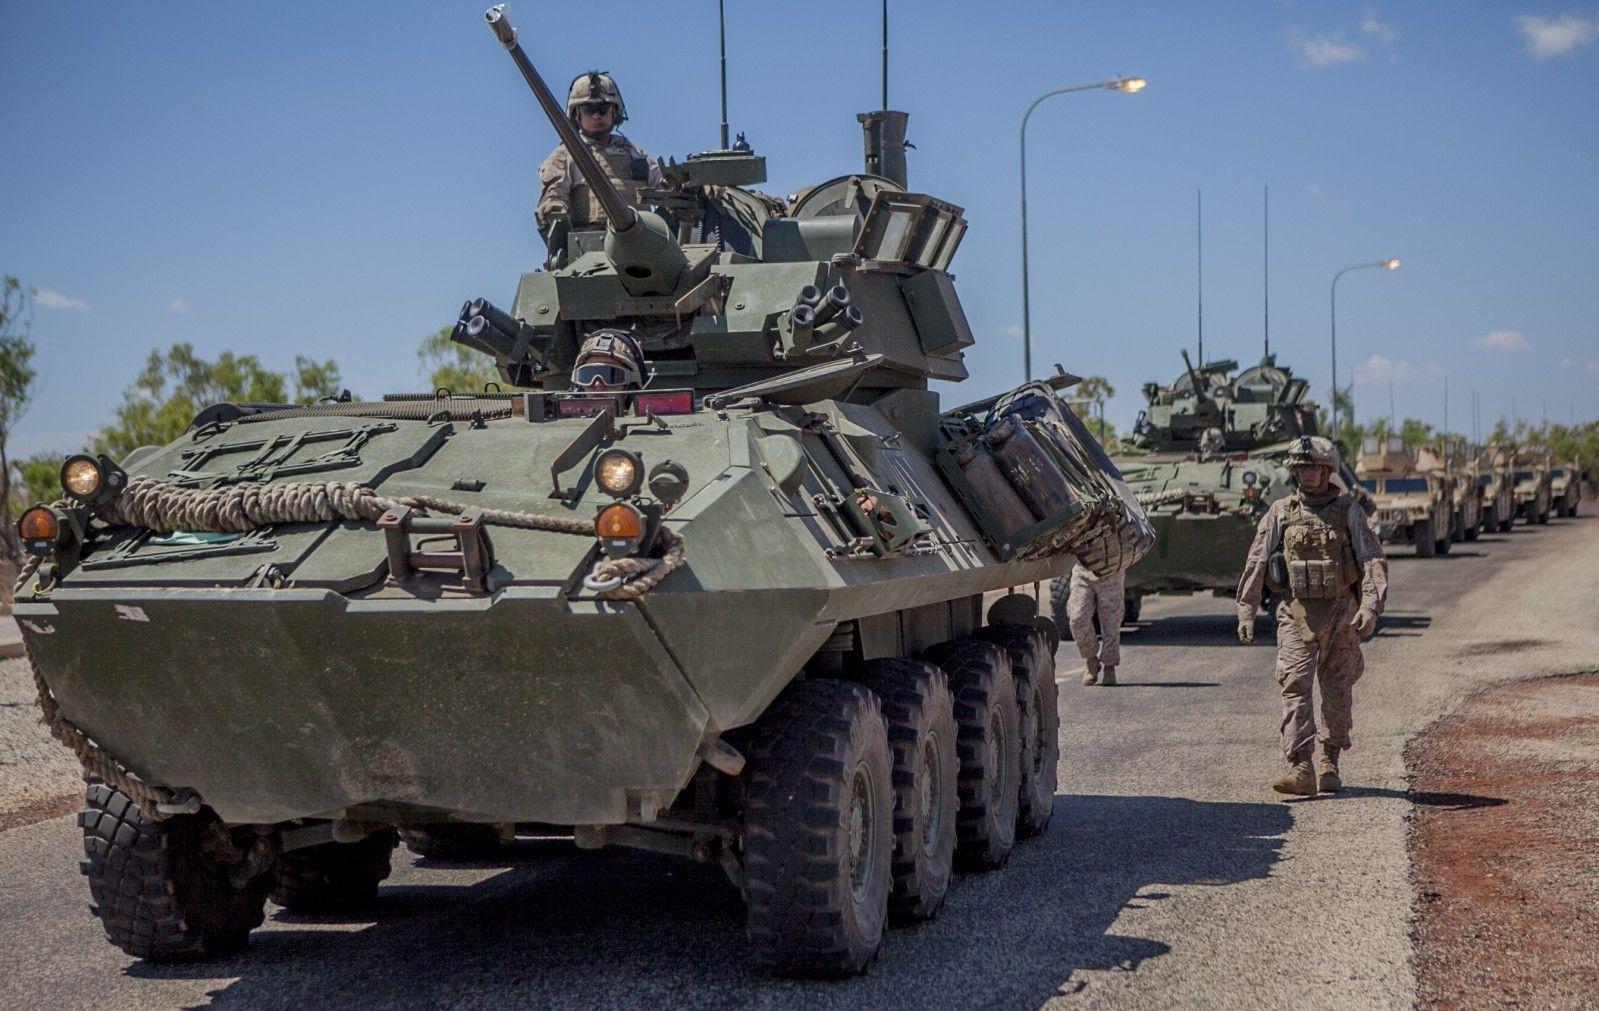 Lav Iii Marine Corps Bases Military Vehicles Military Armor